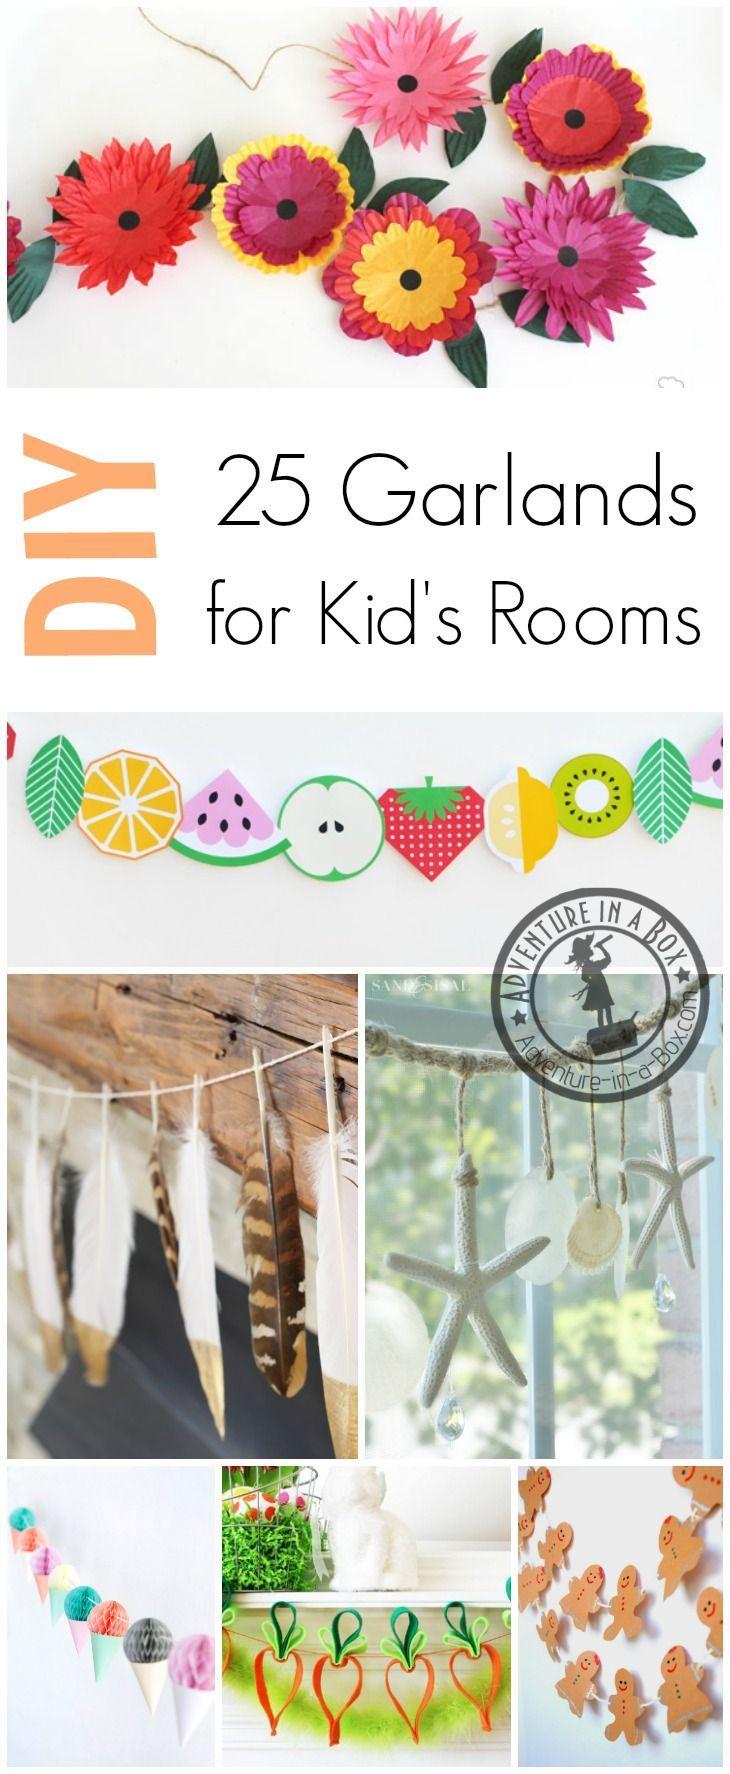 DIY Seasonal Garlands to Decorate Kid's Rooms: Beautiful handmade garlands to celebrate winter, spring, summer and autumn!